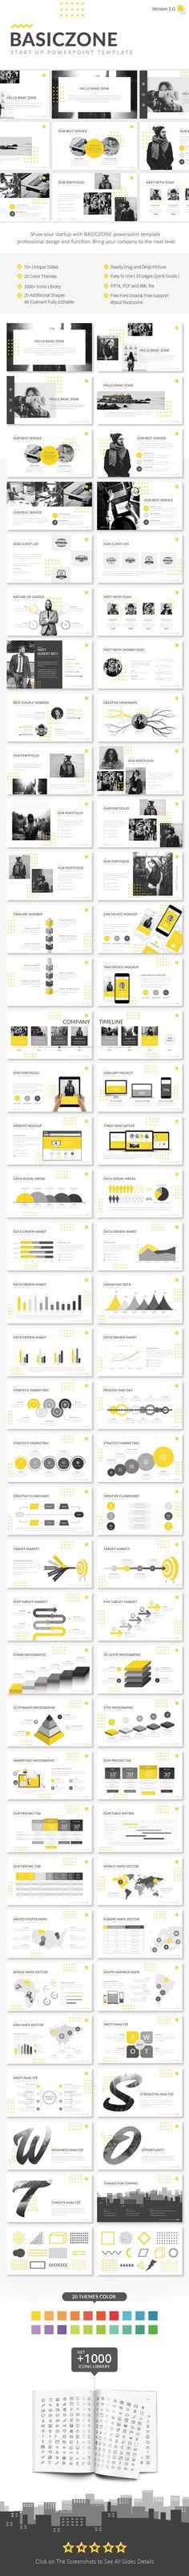 Basiczone V1 - Start Up Powerpoint Template 70+ Unique Slides #pptx